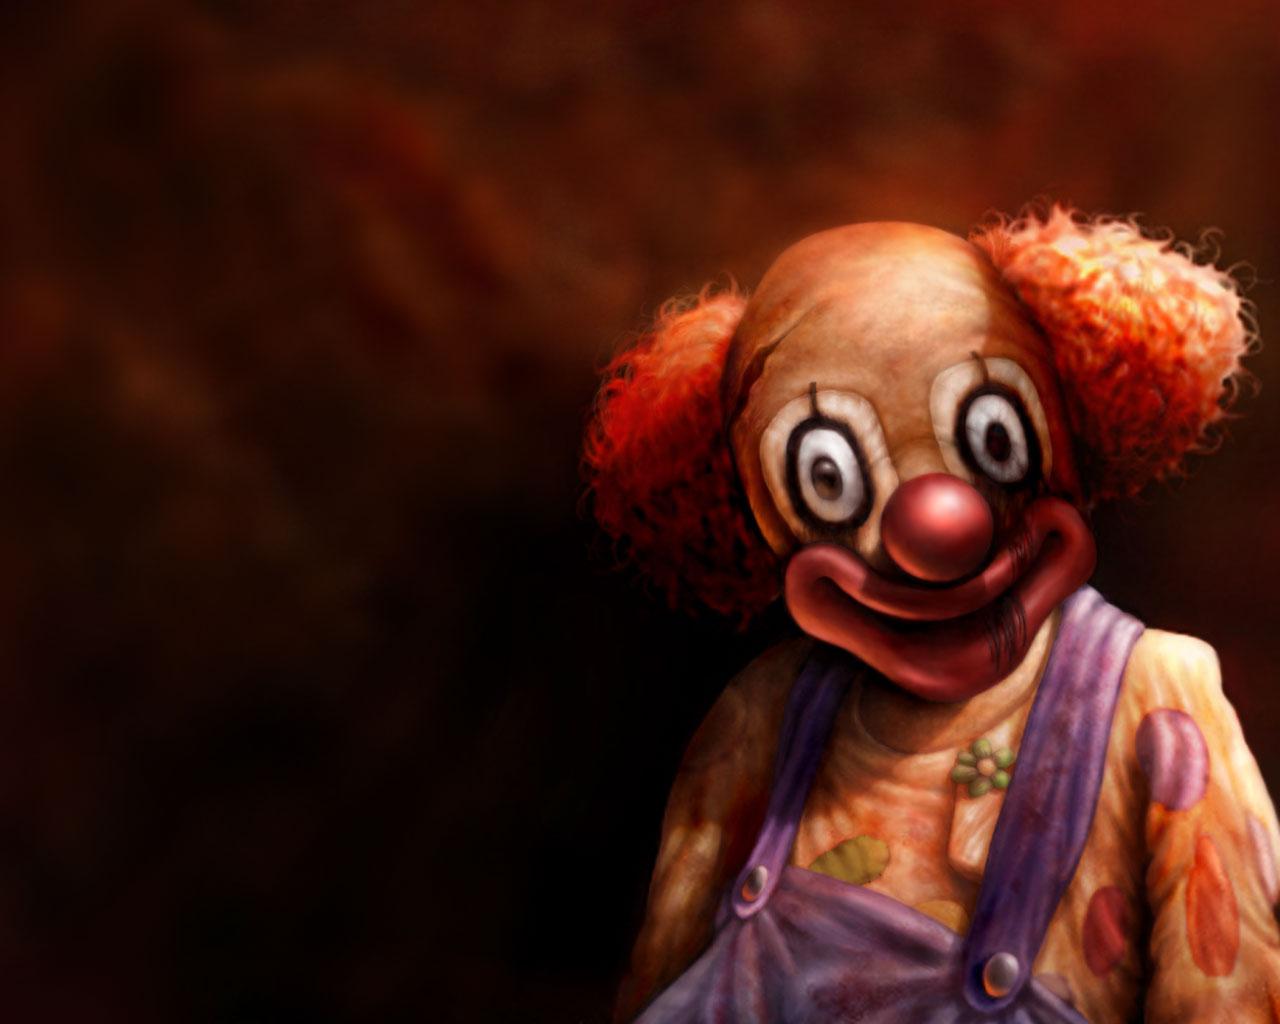 Crazy Clown Wallpaper - WallpaperSafari